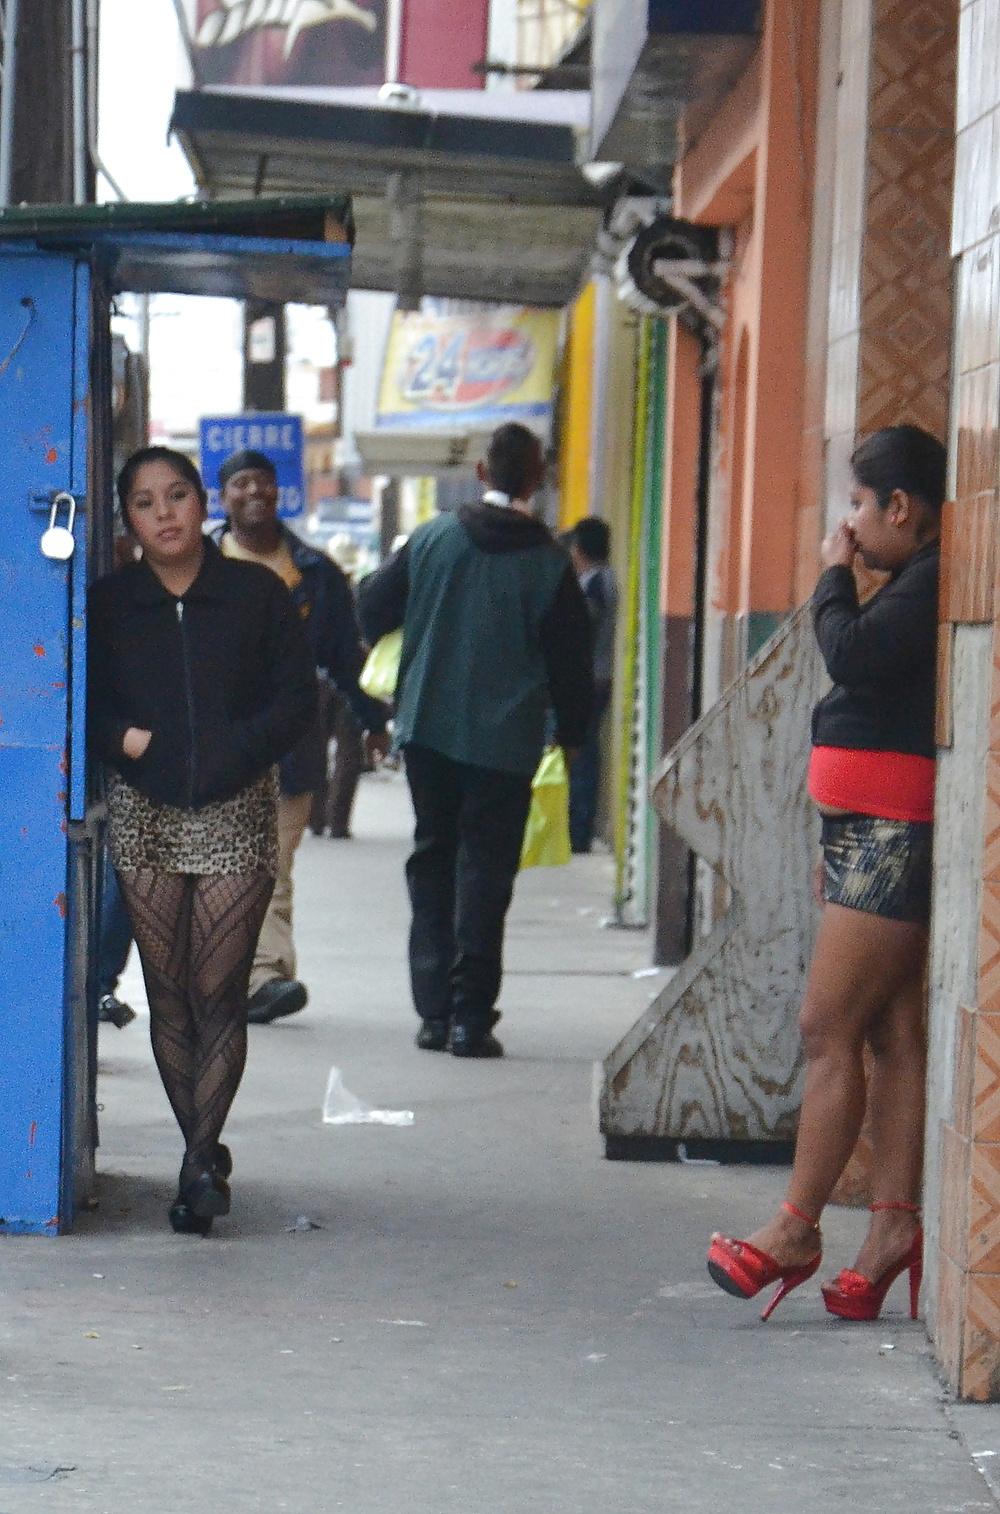 Houston's Top Prostitution Hot Spots